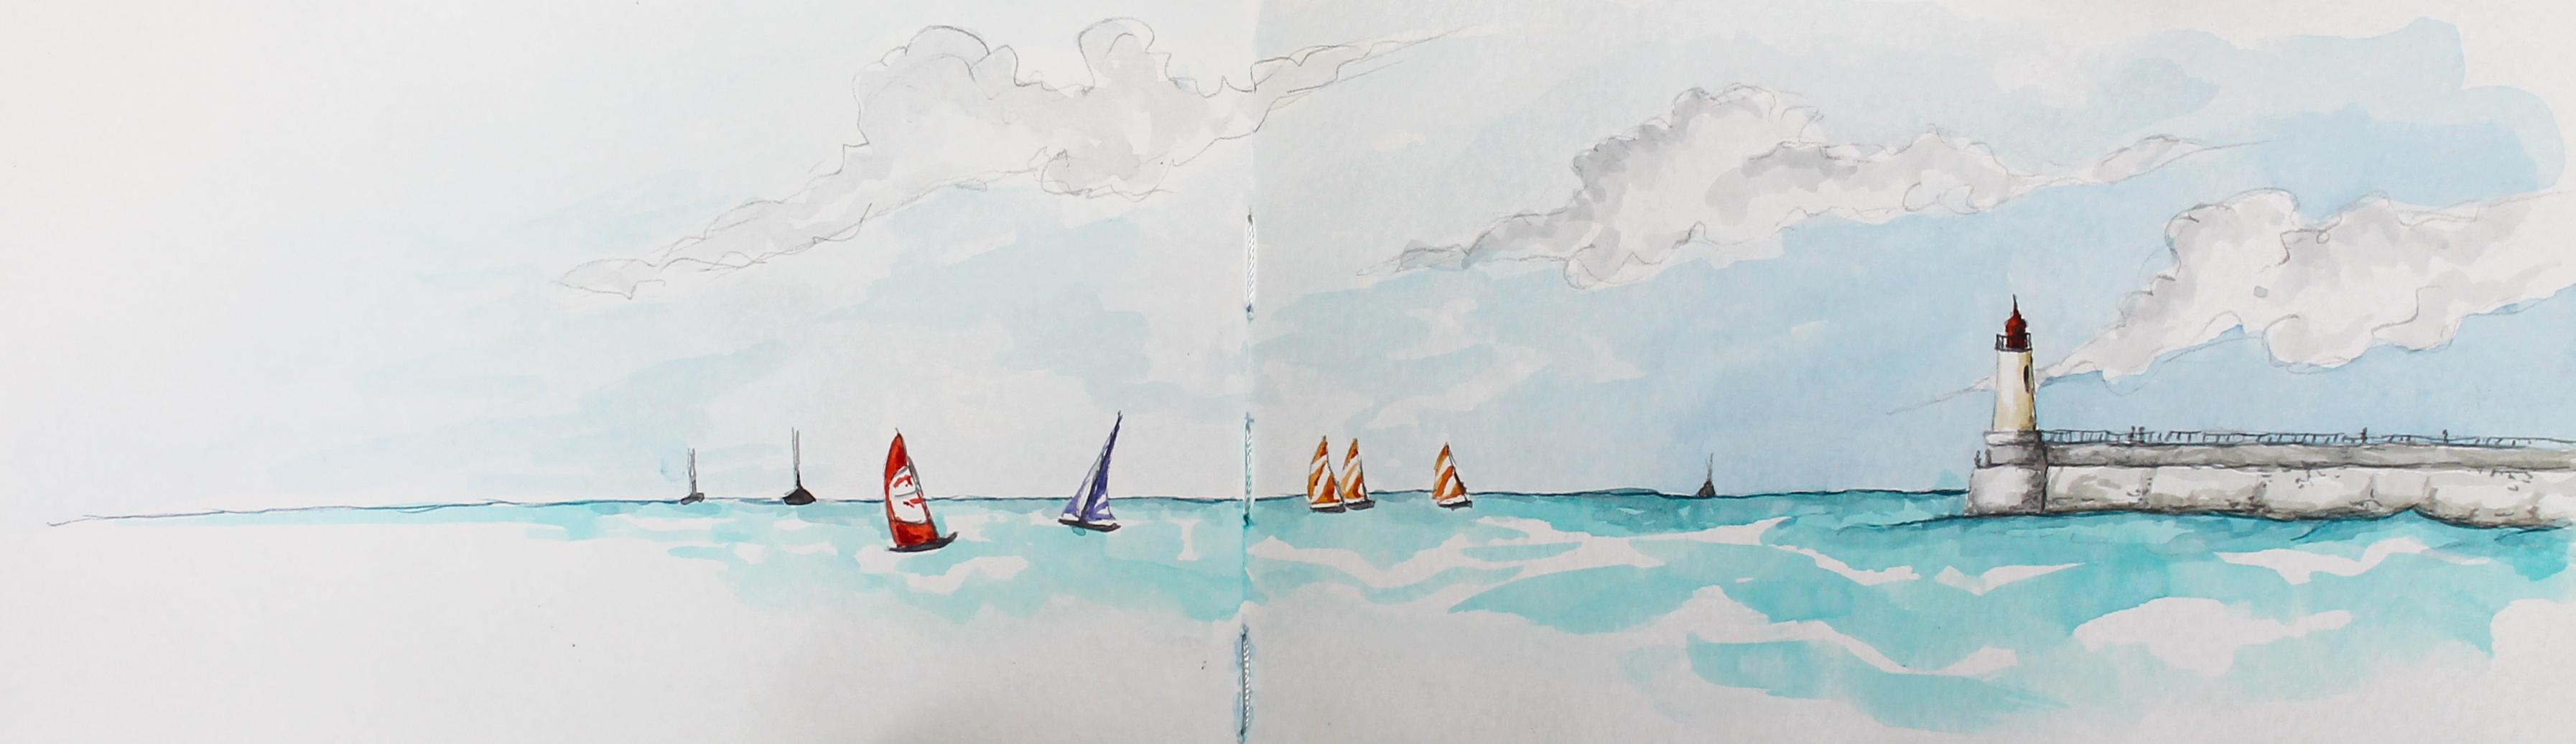 carnet-de-voyage-velo-france